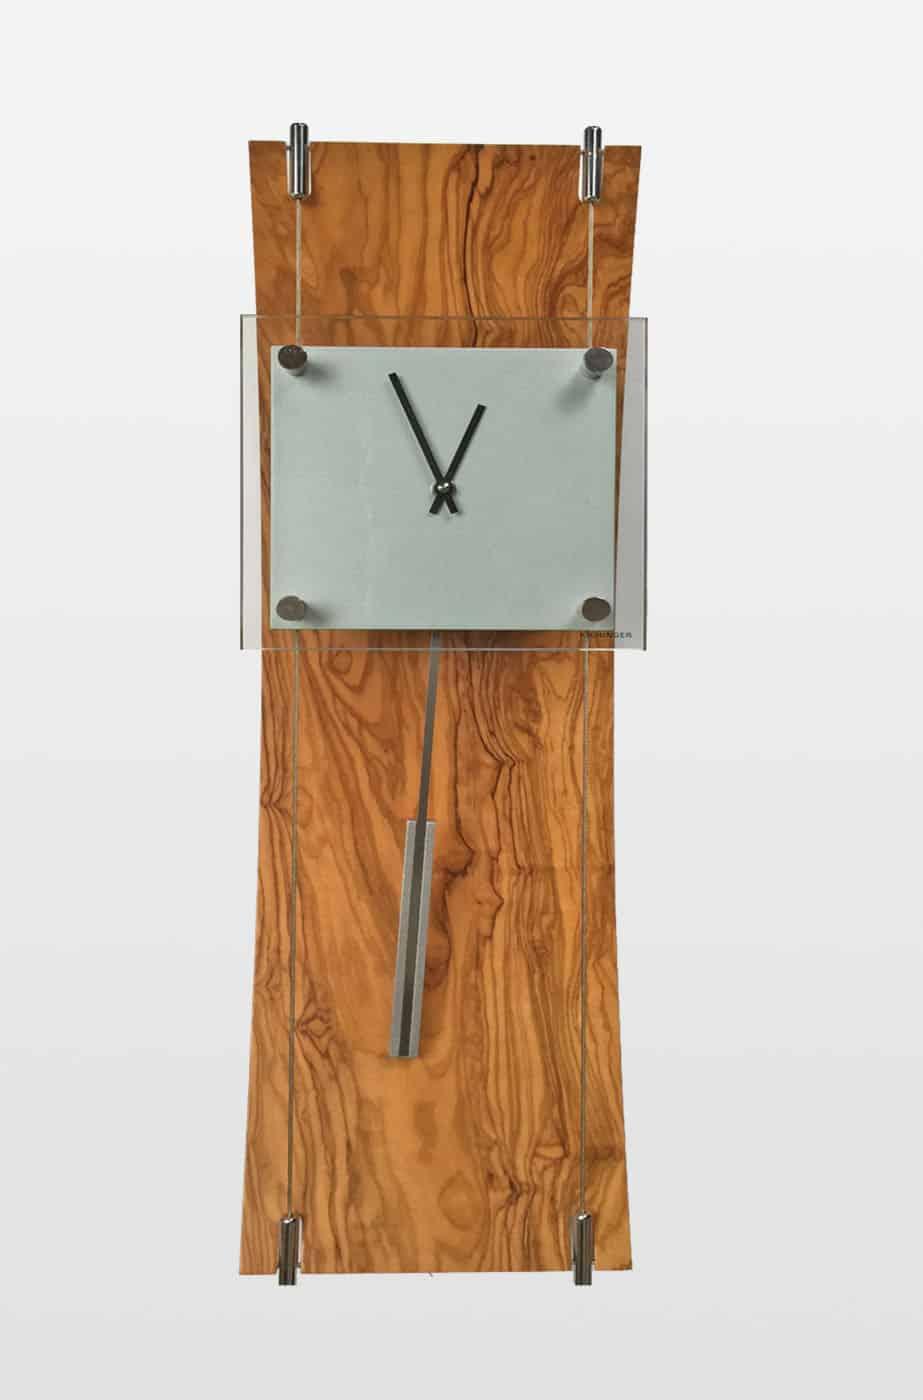 K Clock Contemporary Wall Clock